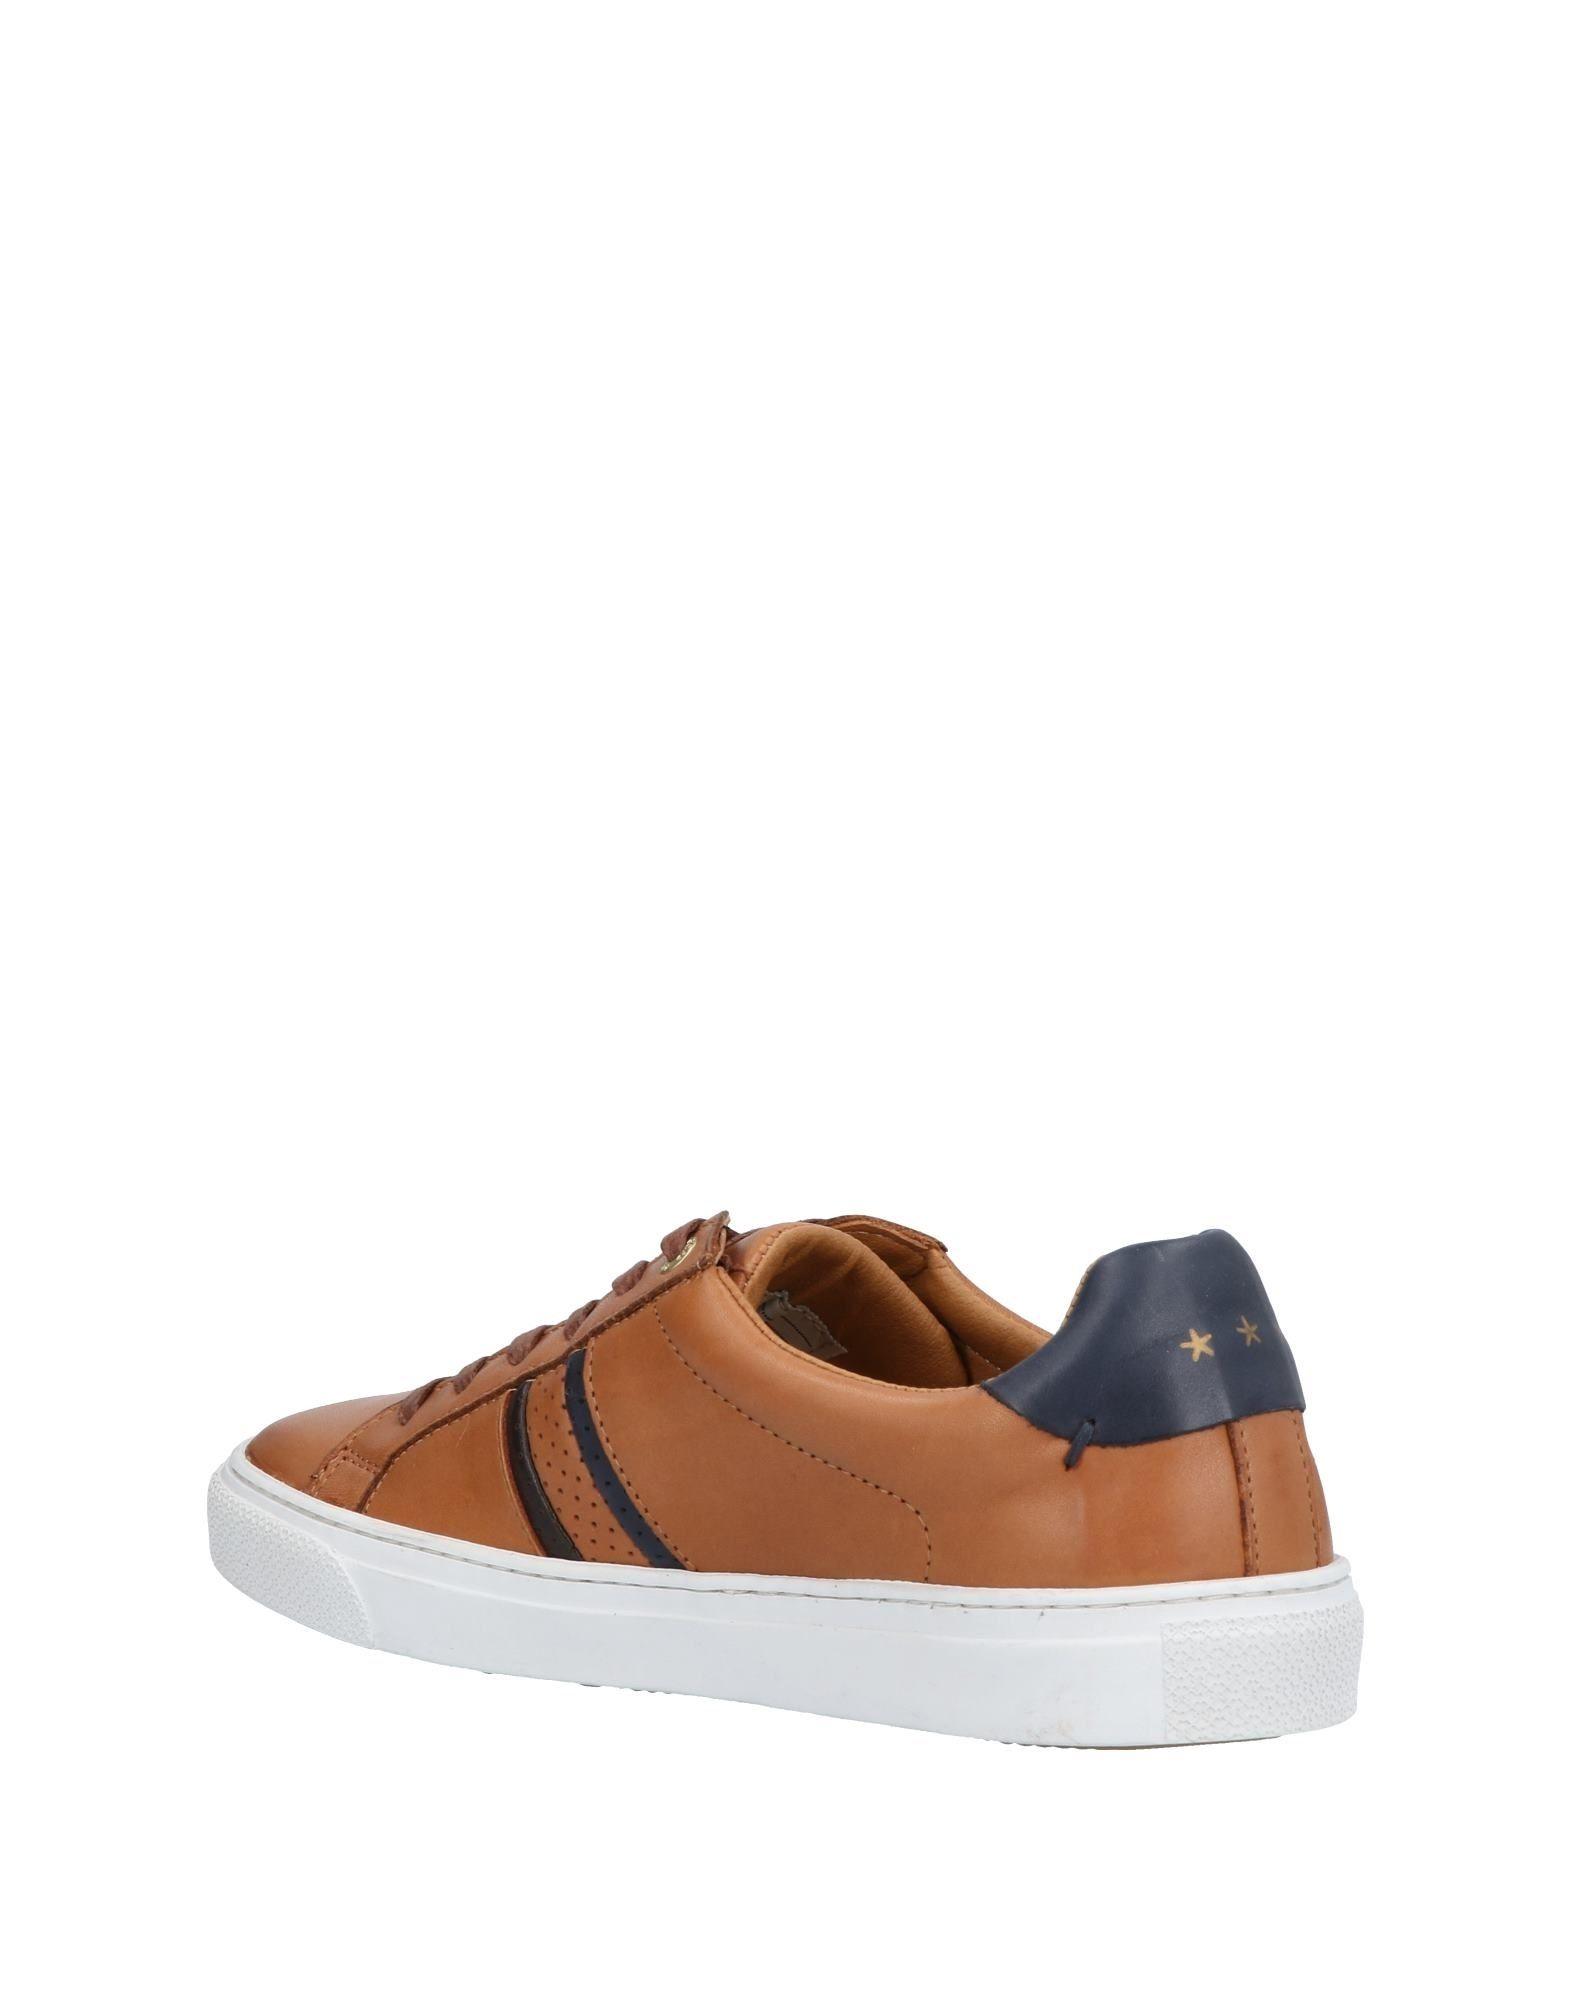 D'oro Pantofola D'oro  Sneakers Herren  11456299CA cc7cbb